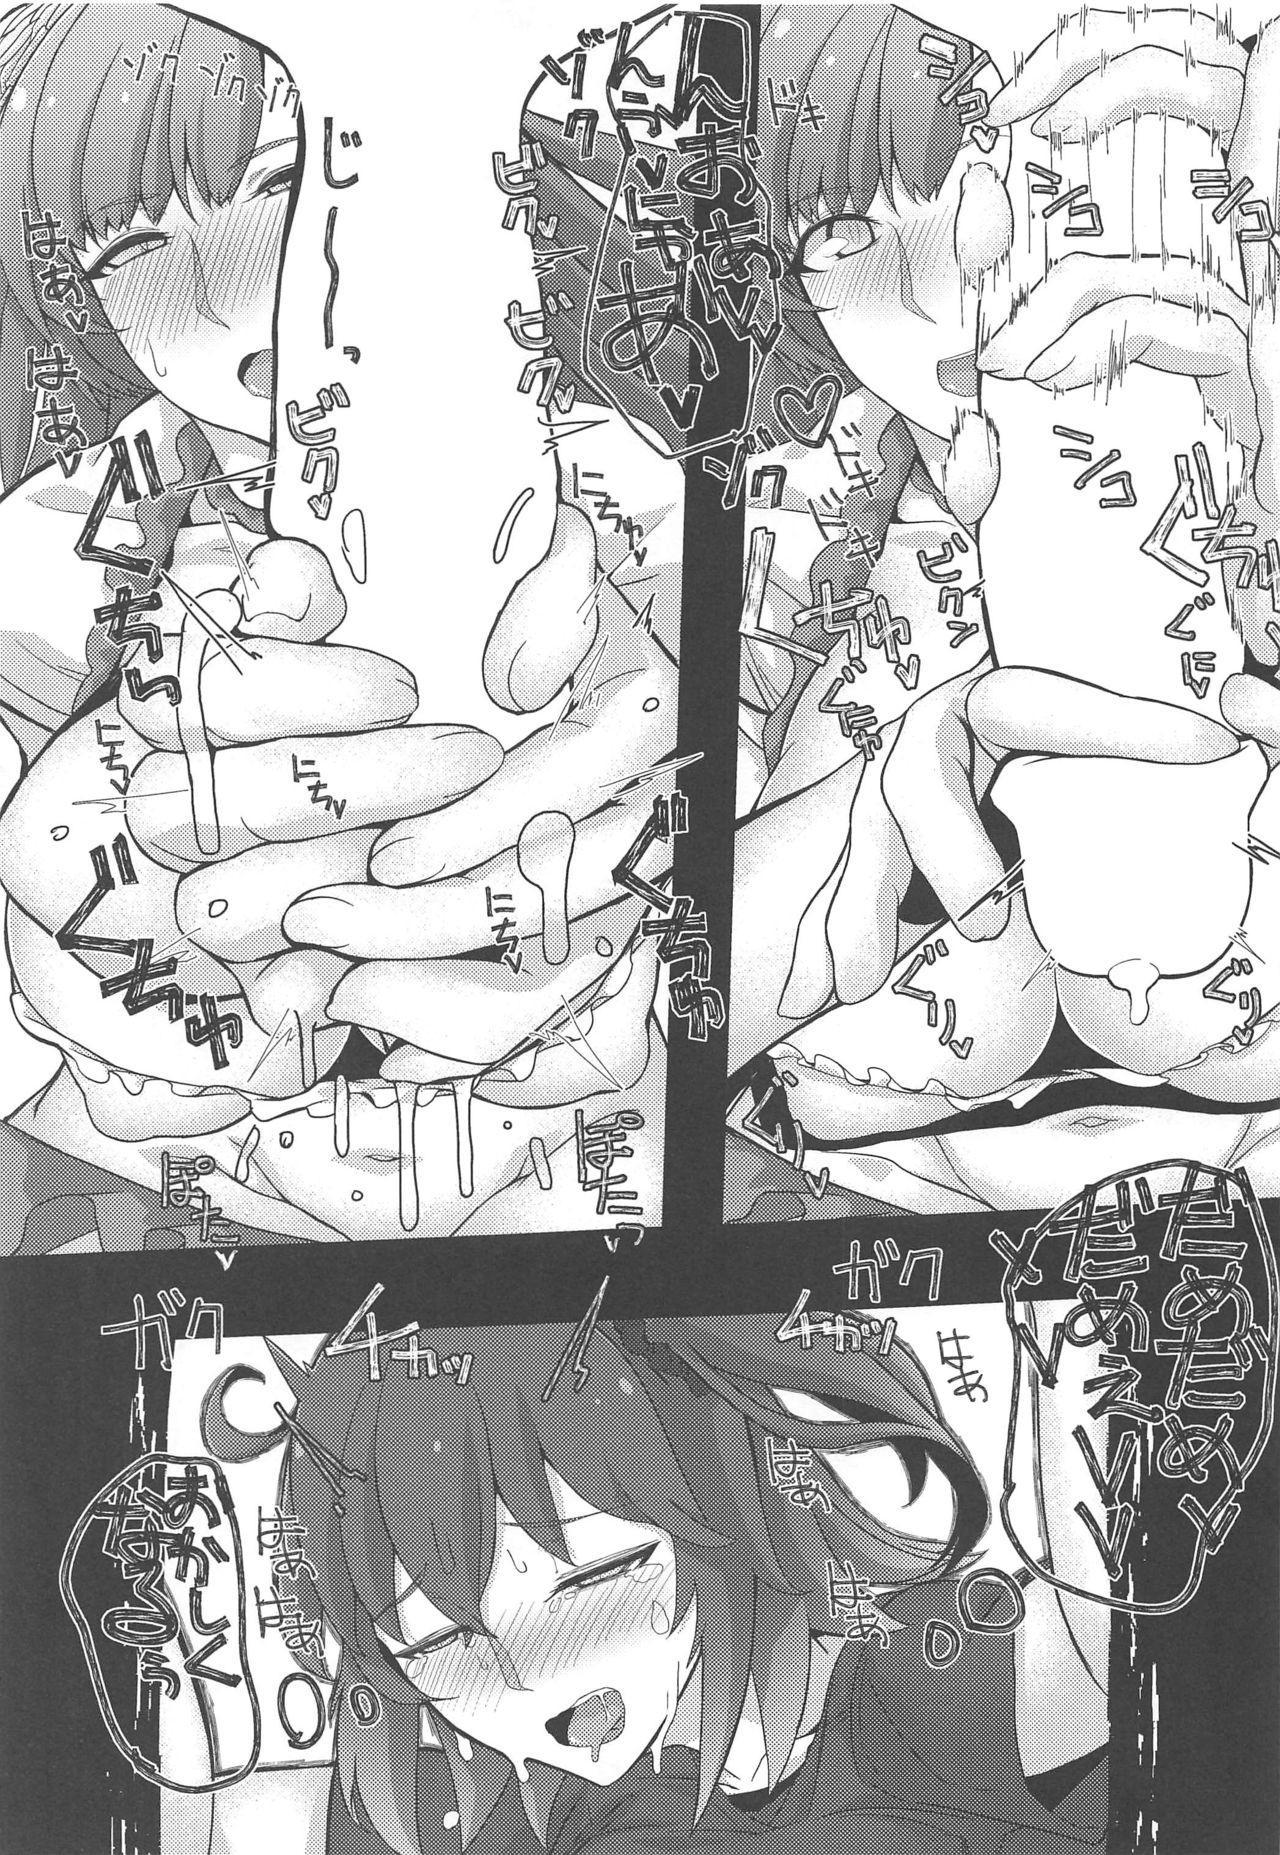 Ukiuki Pheromone 7